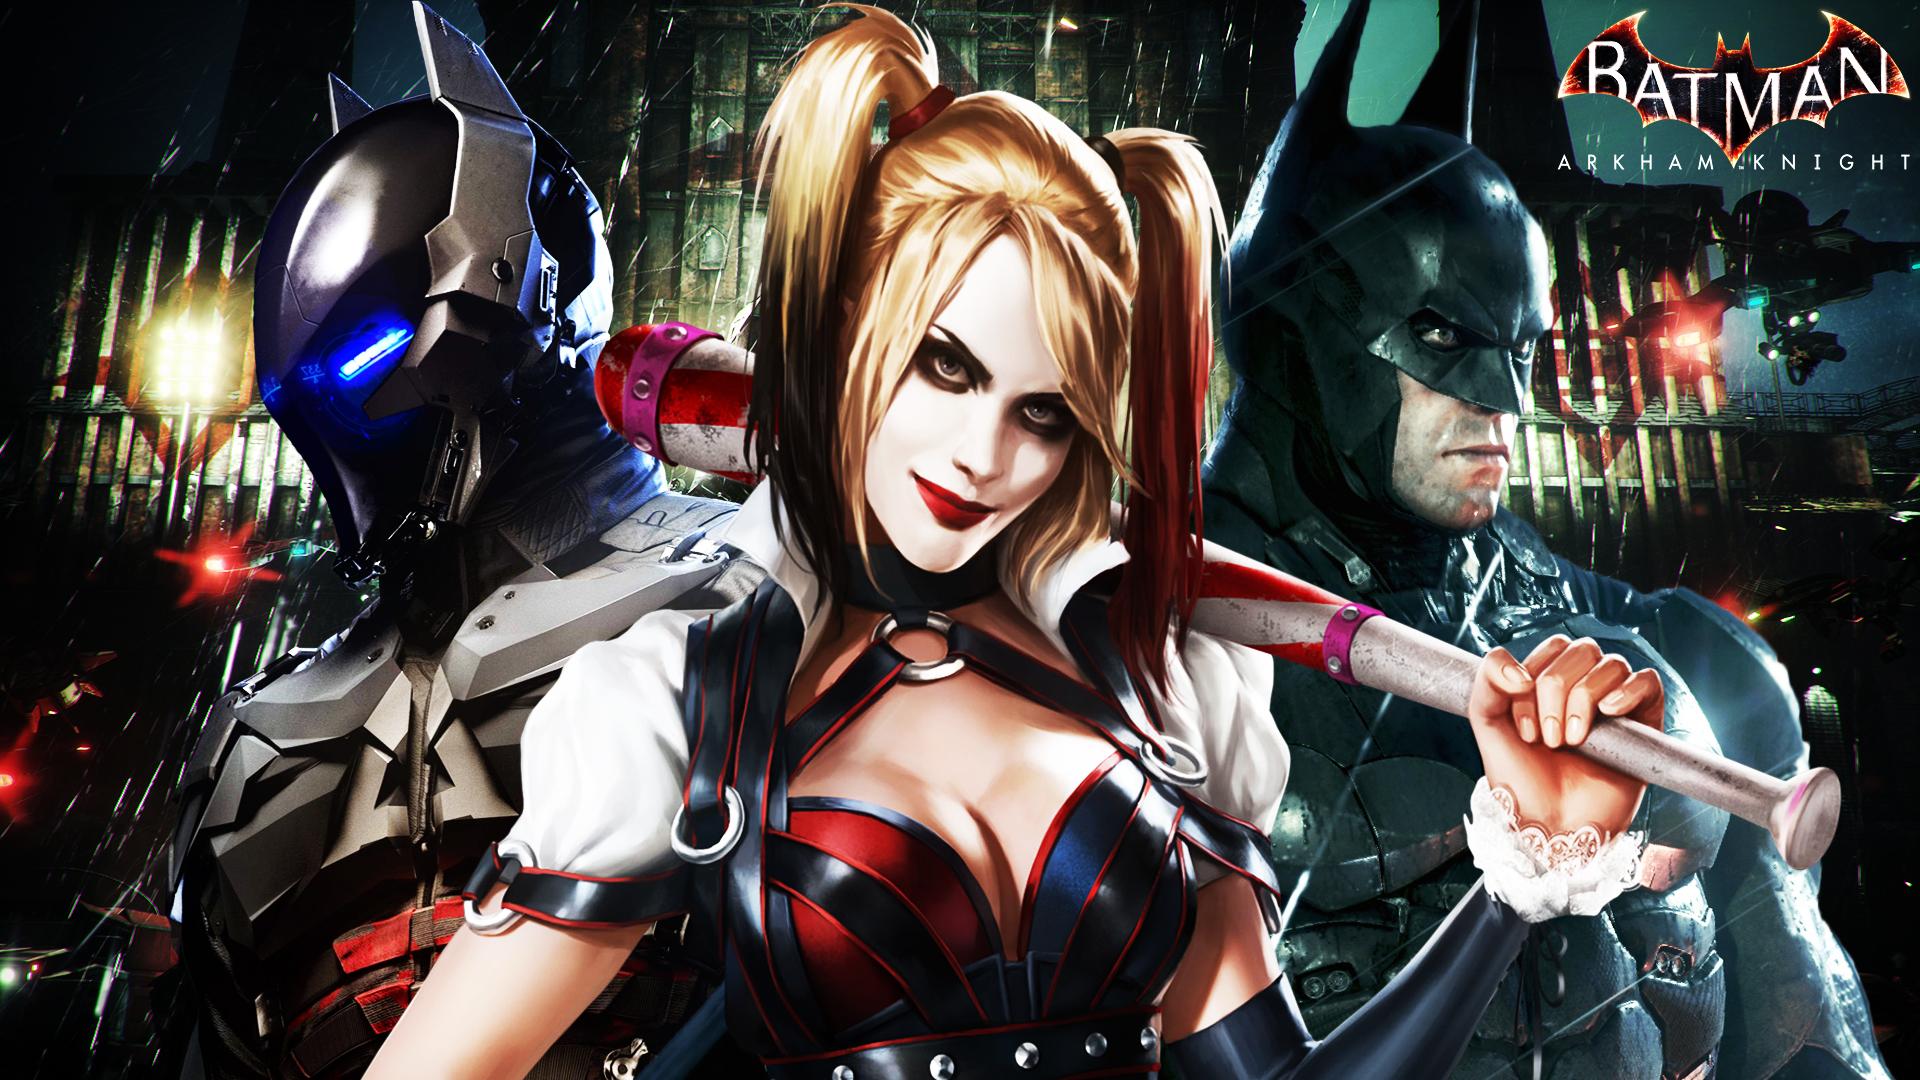 Batman Arkham Knight Hd Wallpaper 2 By Rajivcr7 On Deviantart